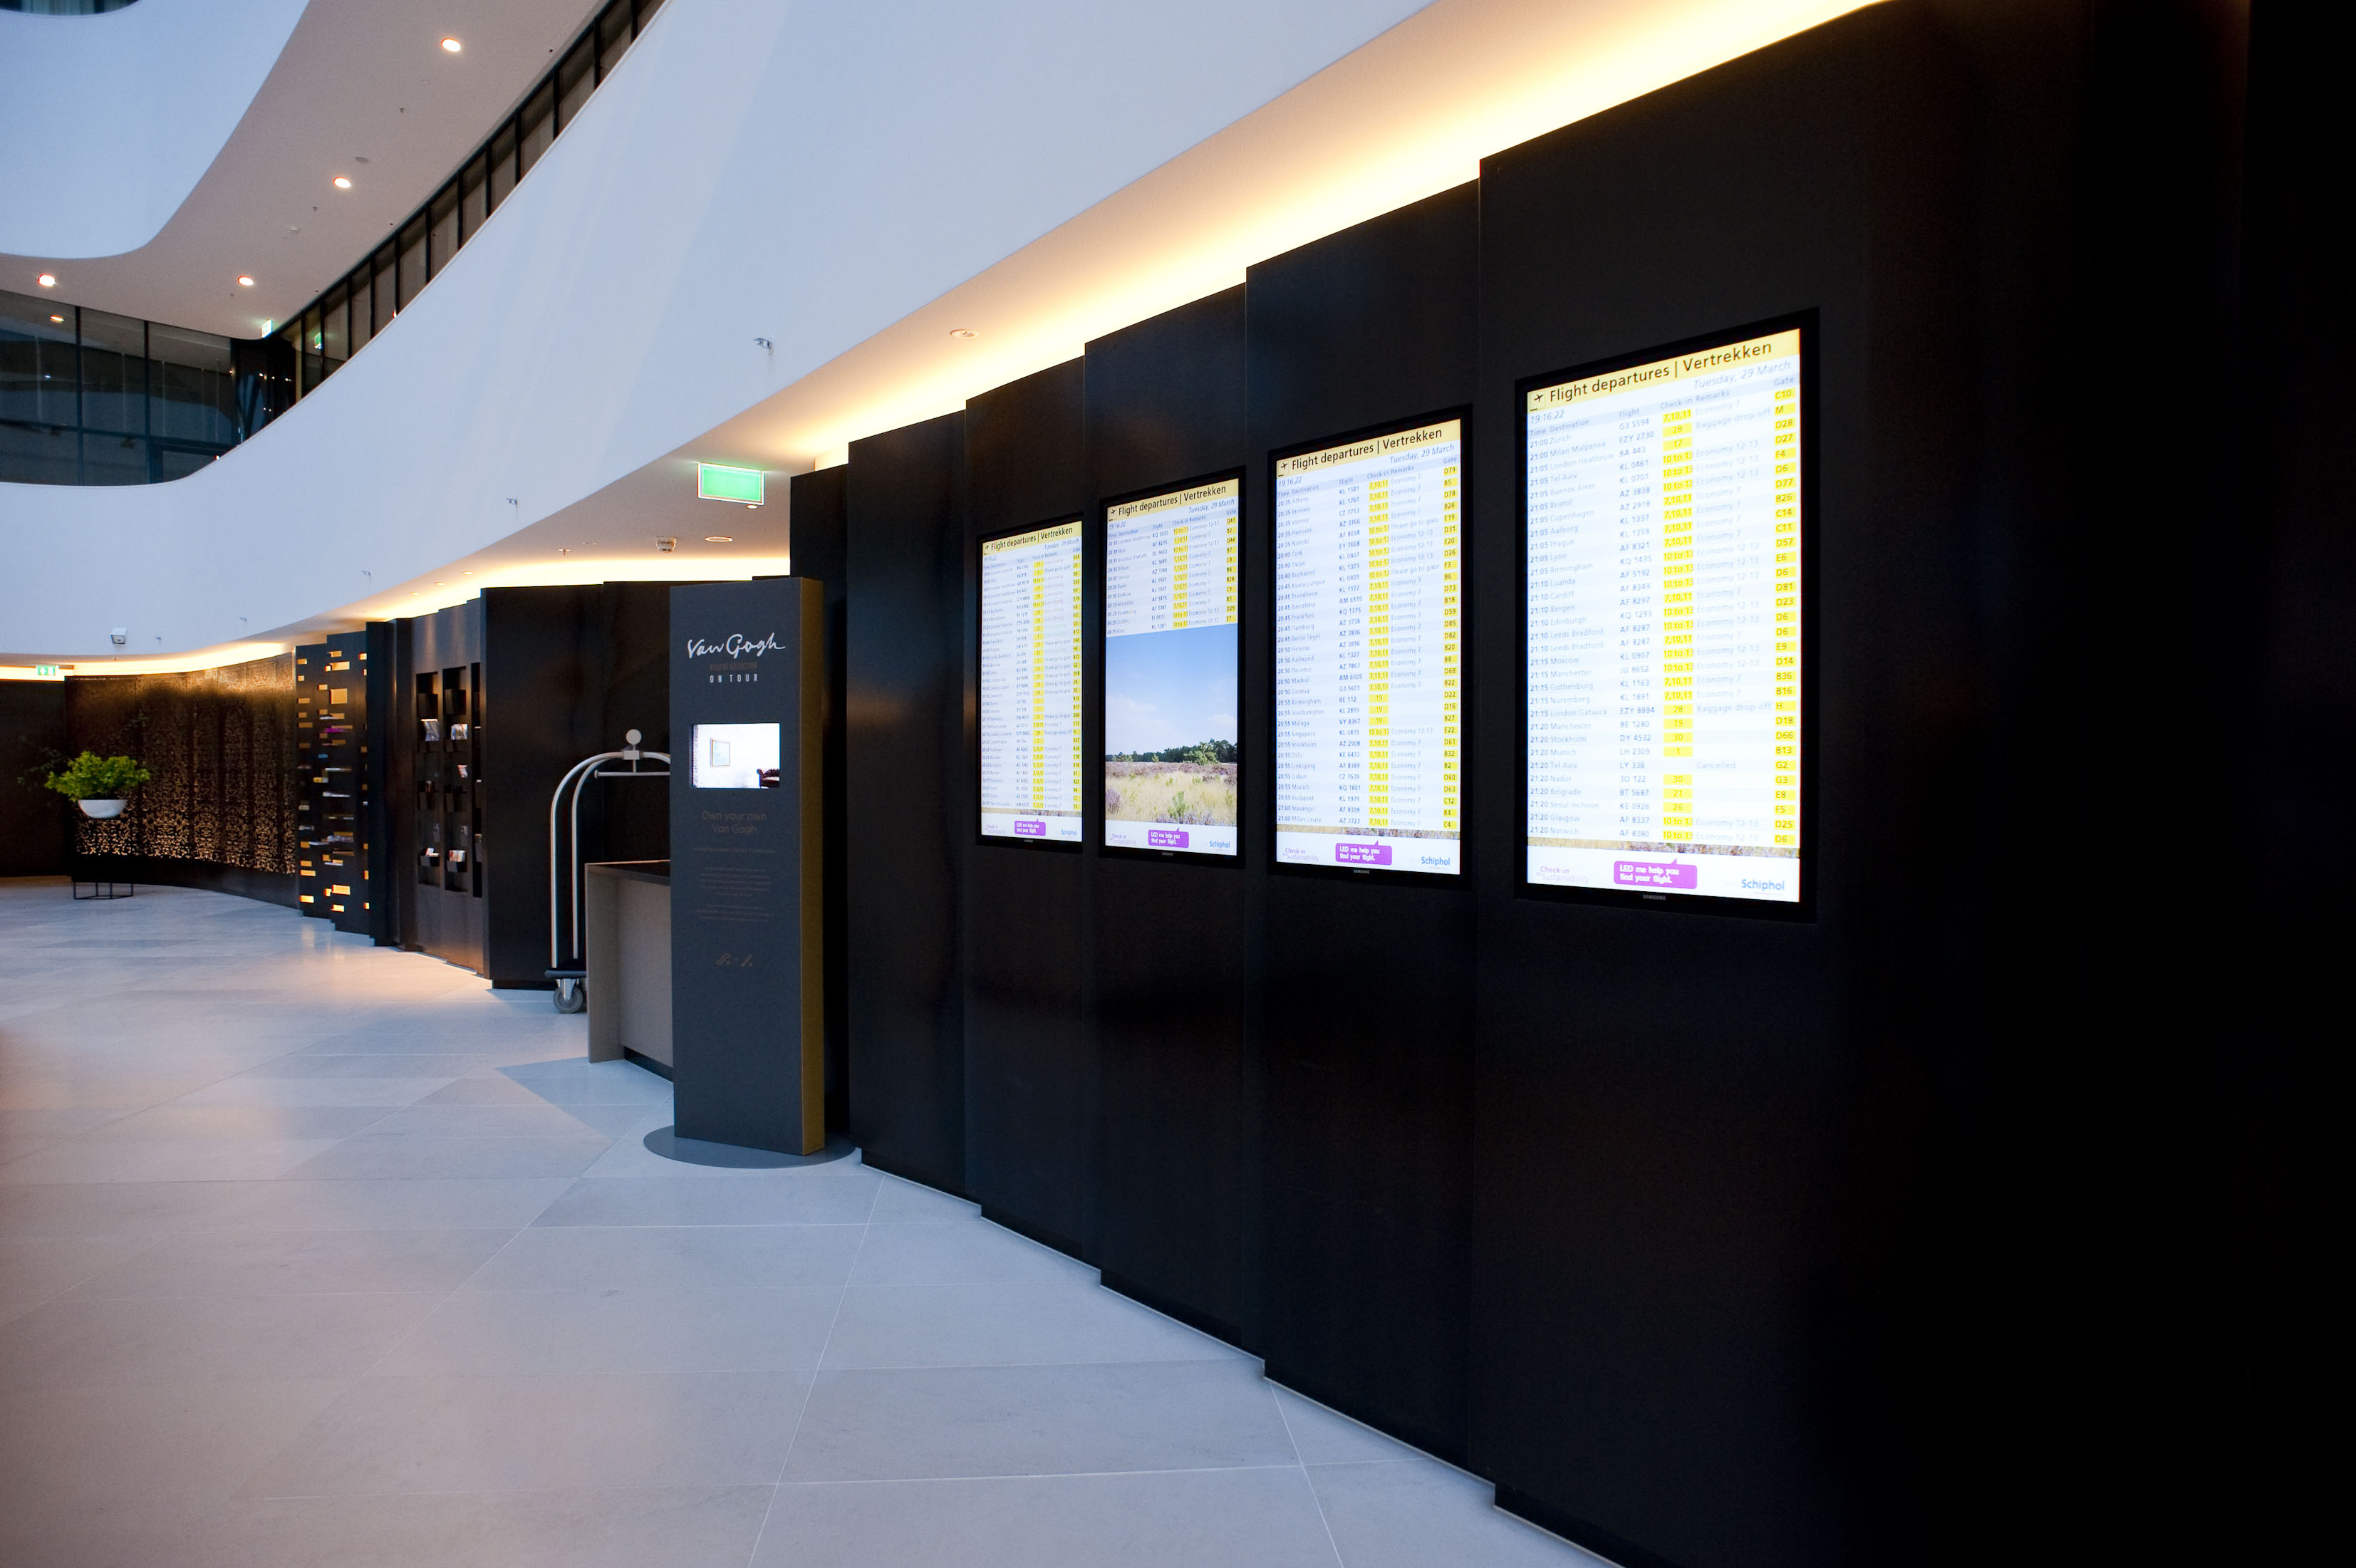 Hilton Airport Schiphol Narrowcasting